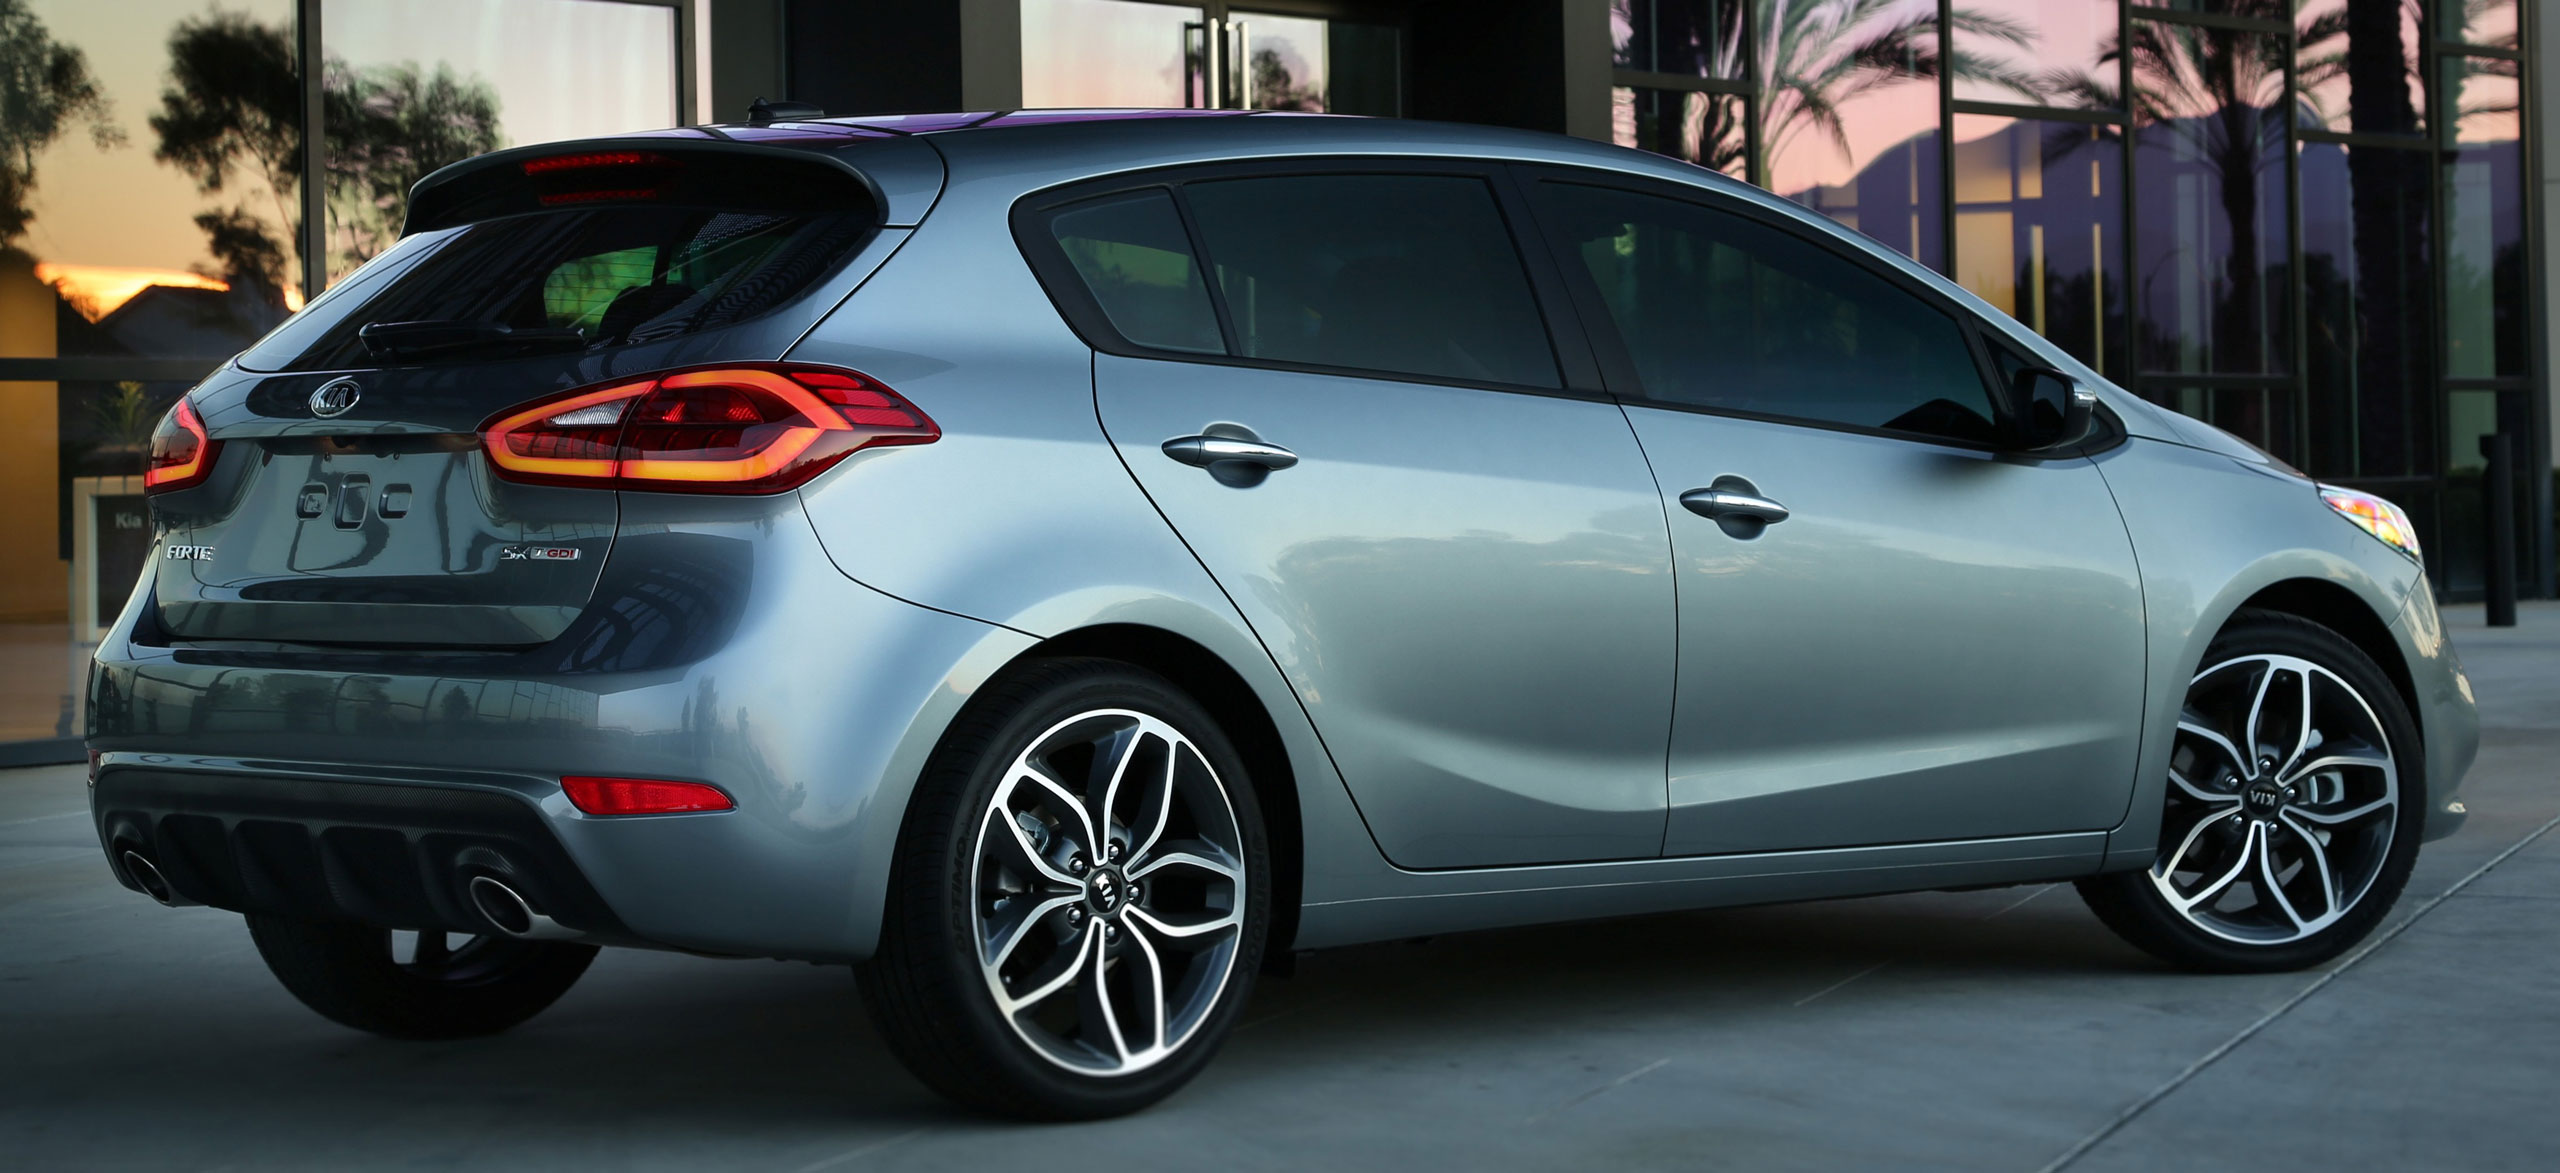 Kia Forte Hatchback >> All New Kia Forte 5 Door Hatchback Makes World Debut At